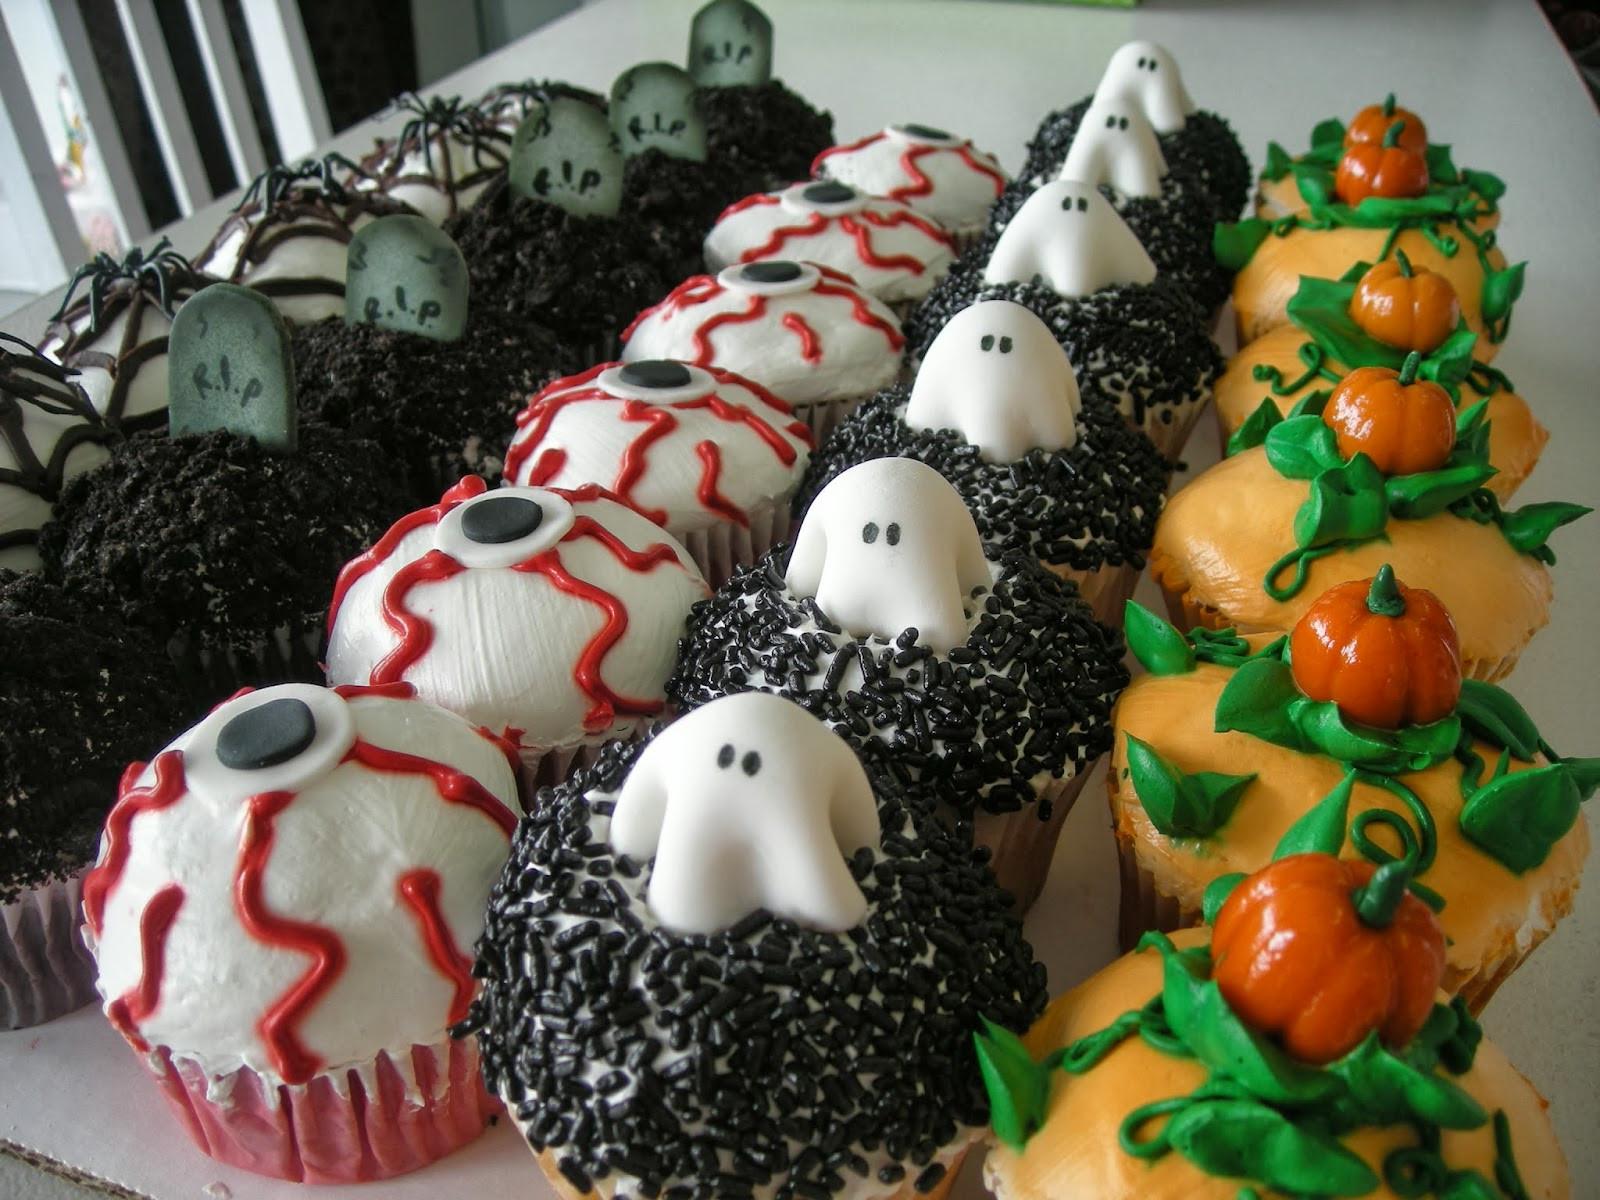 Halloween Cupcakes Decorating Ideas  Halloween Cake Decorating Ideas